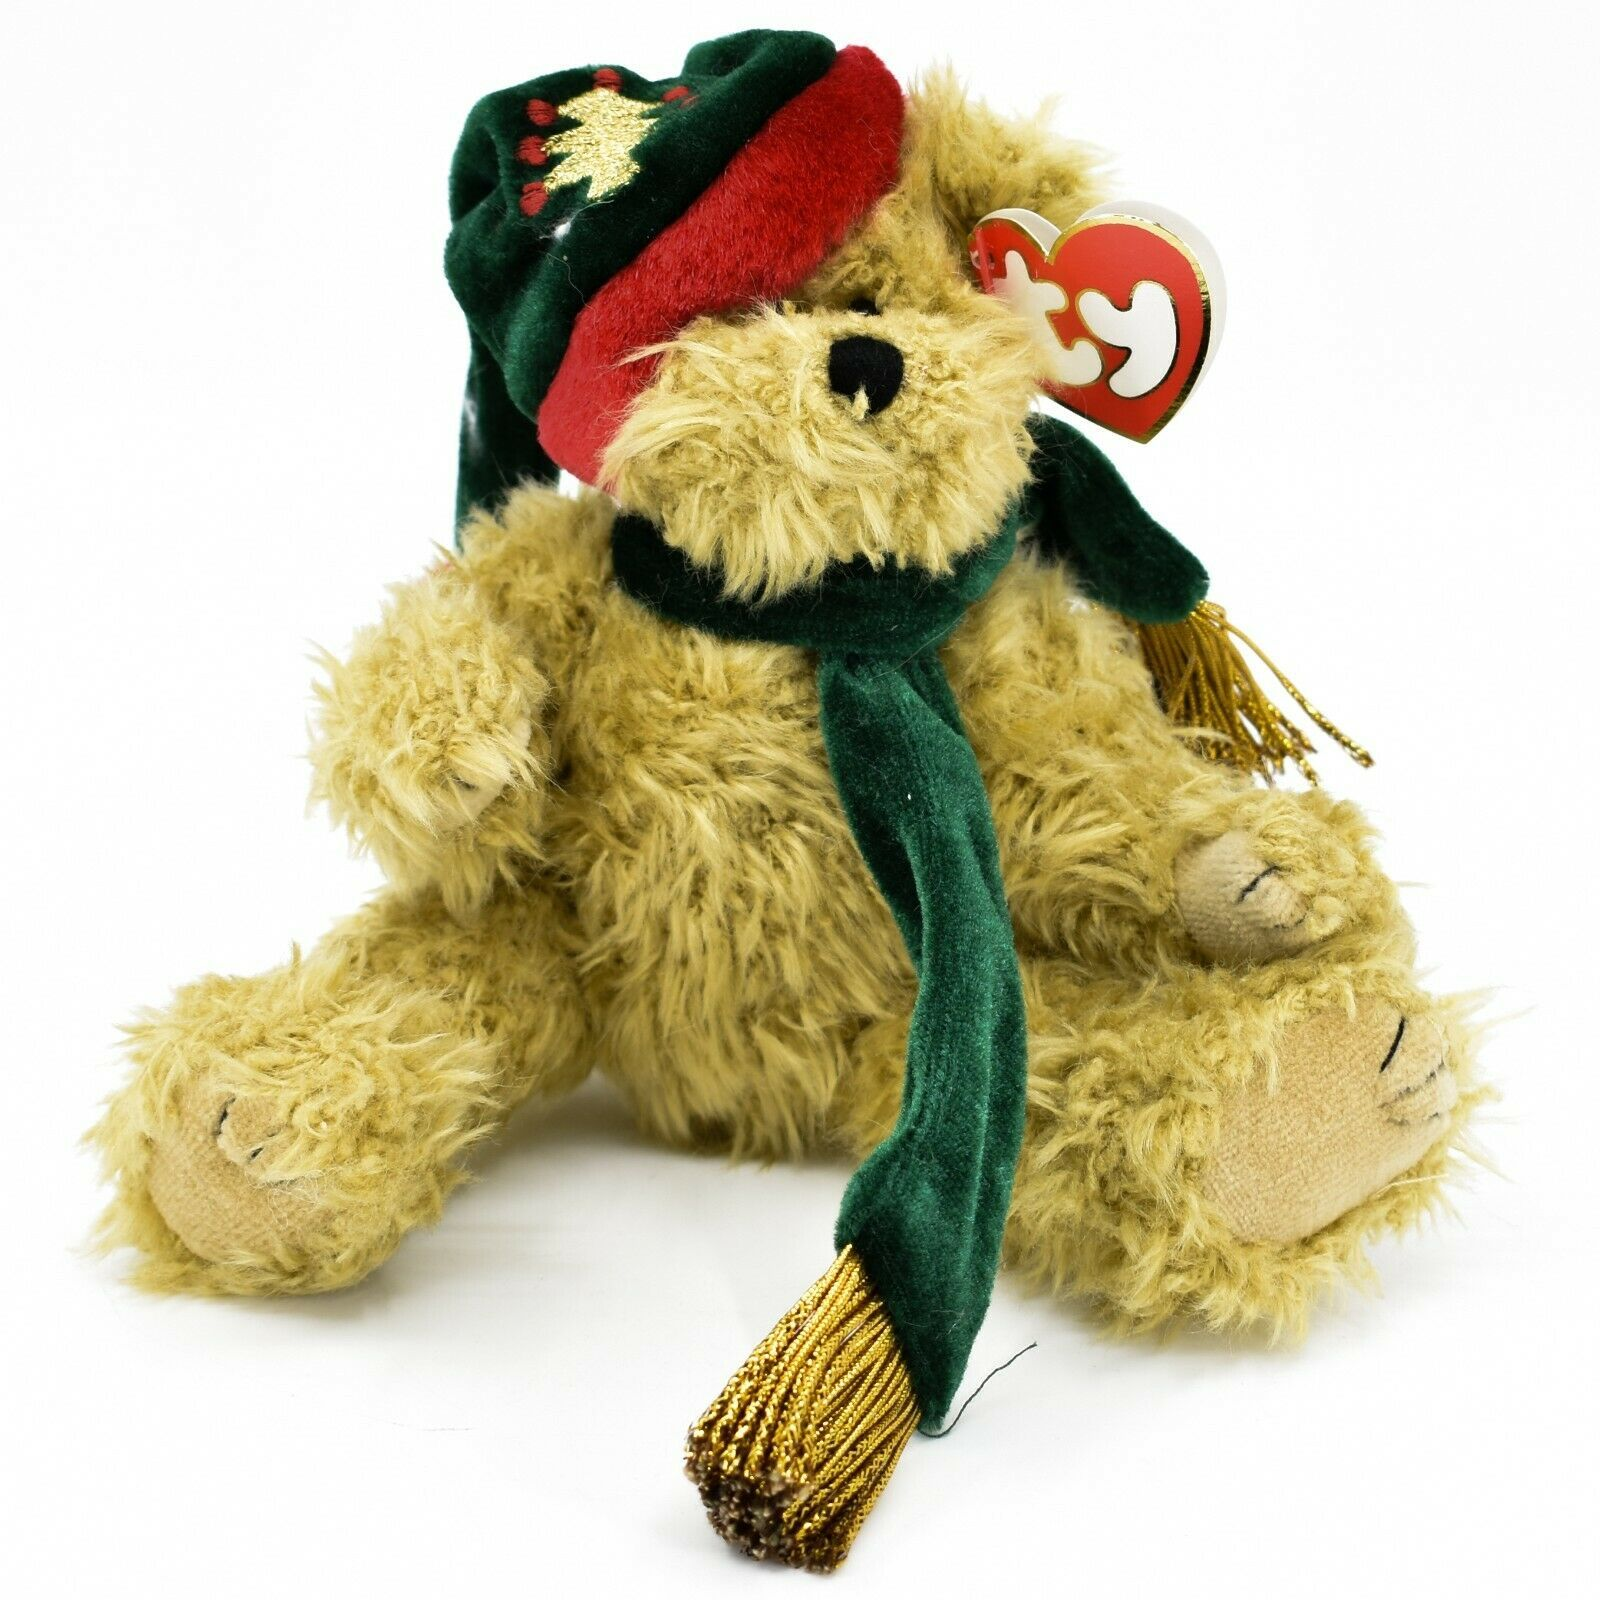 1993 Ty Attic Treasures Spruce Holiday Christmas Teddy Bear Beanbag Plush Toy